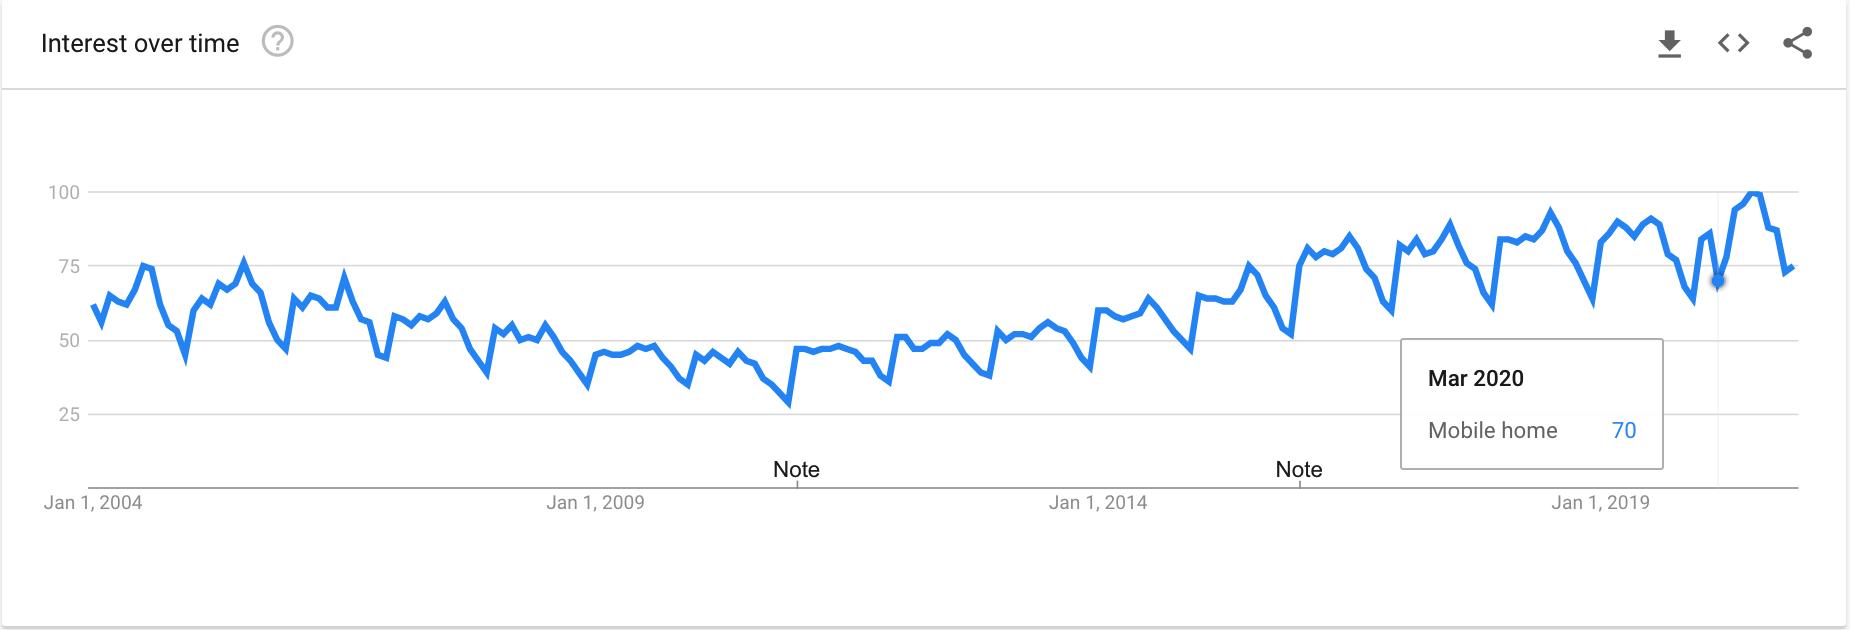 Mobile Home Interest on Google